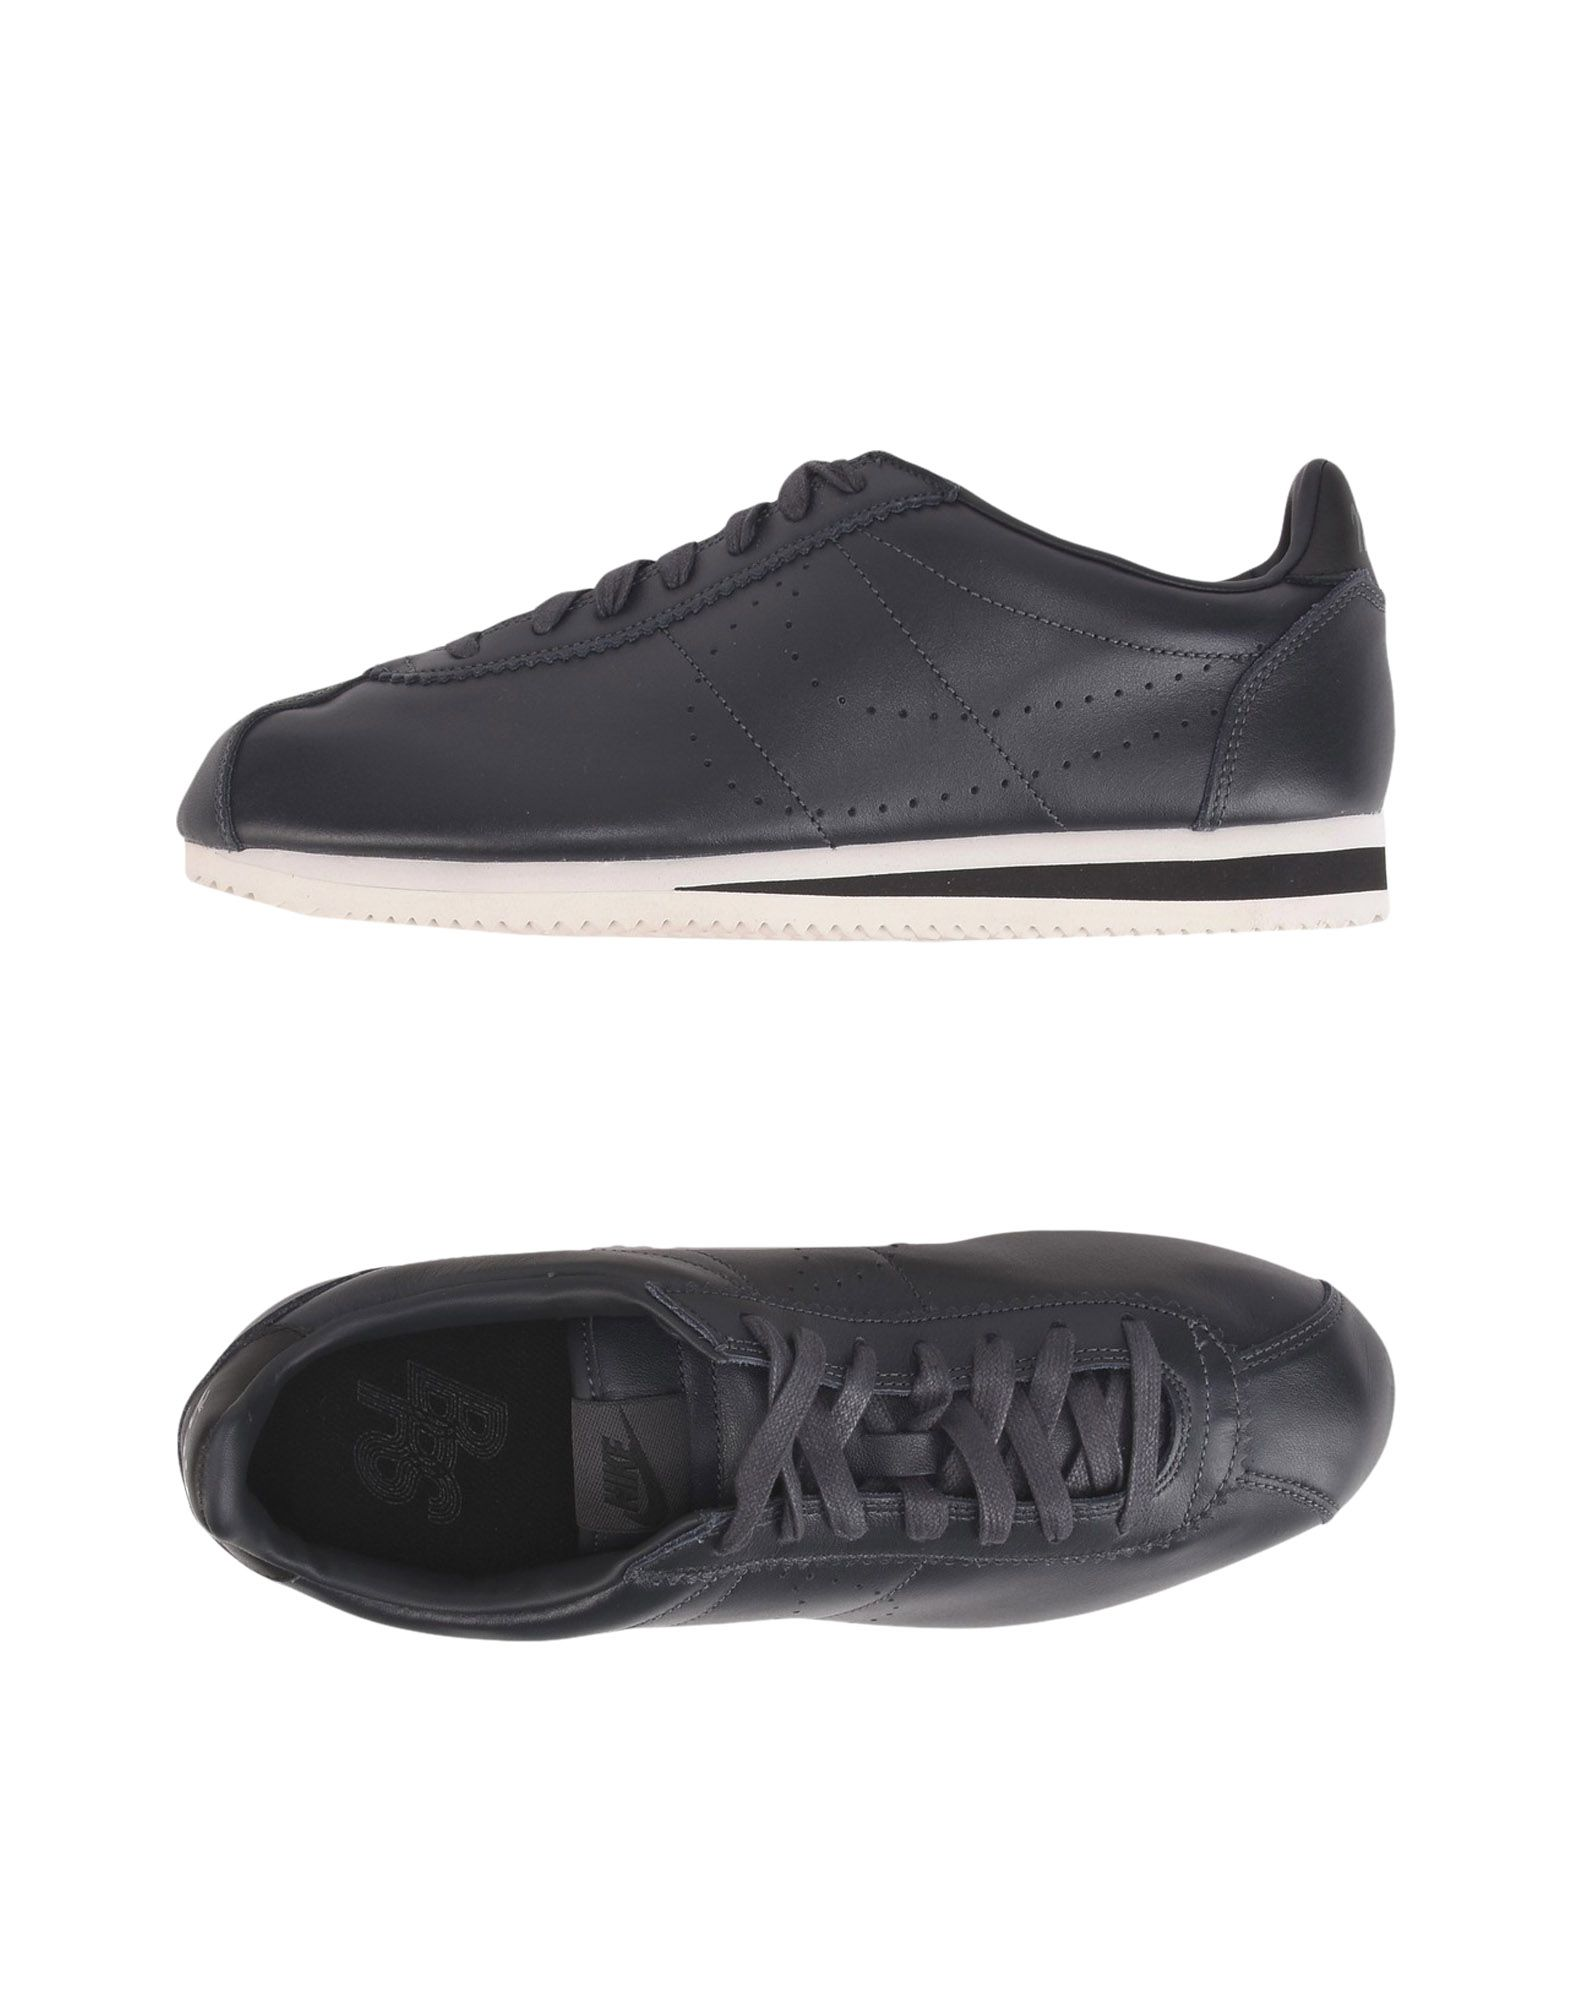 Turnschuhe Nike Classic Cortez Leather Premium - herren - 11441161NA